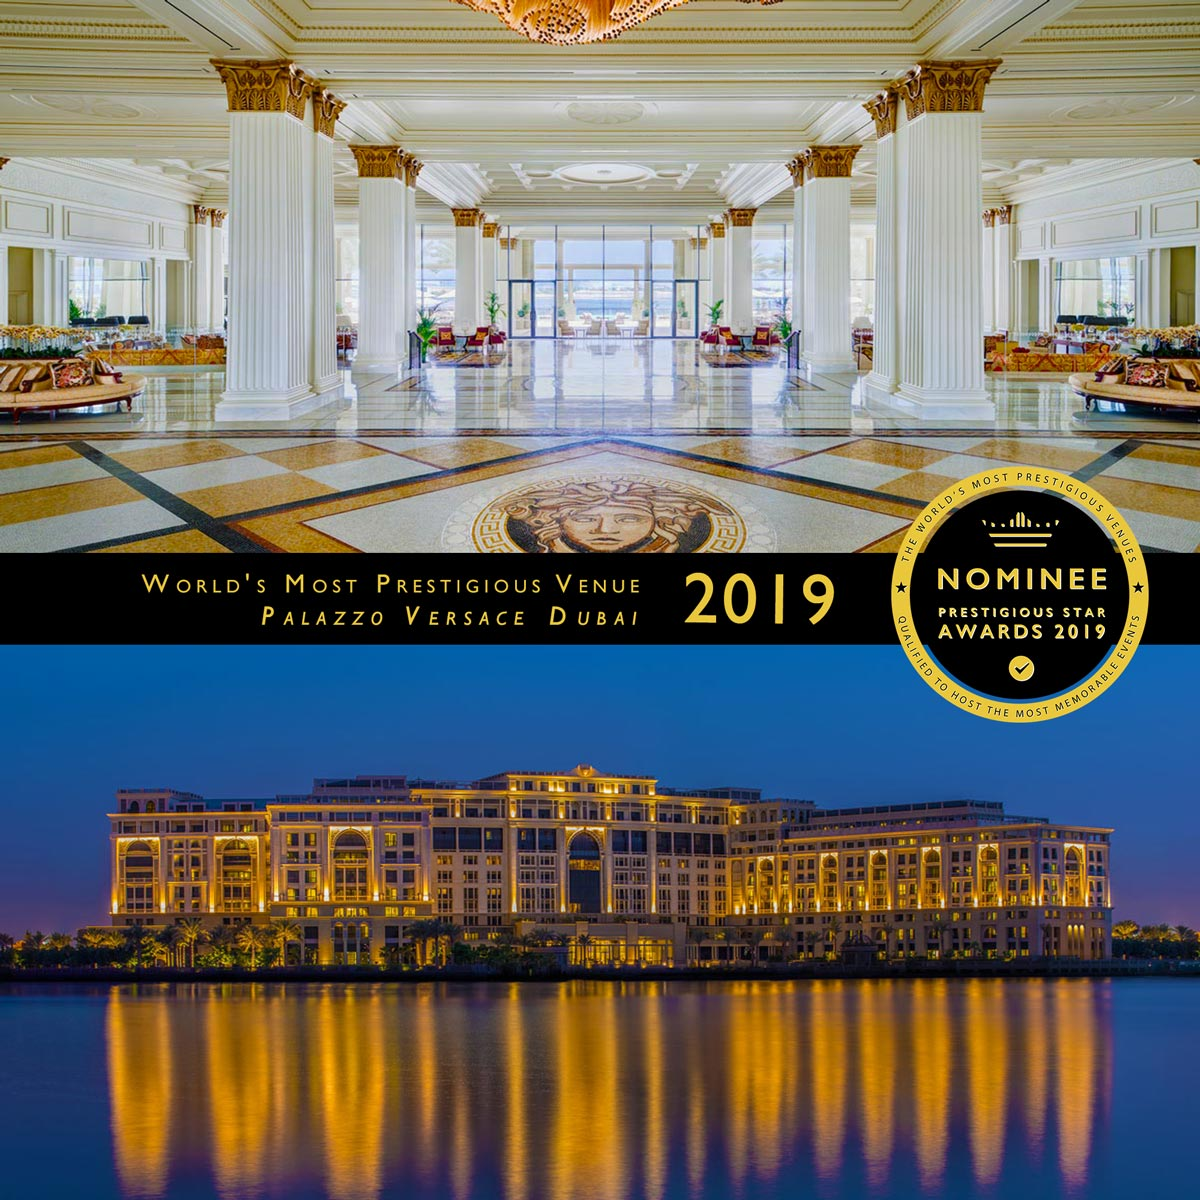 Signature Suite at Palazzo Versace Dubai